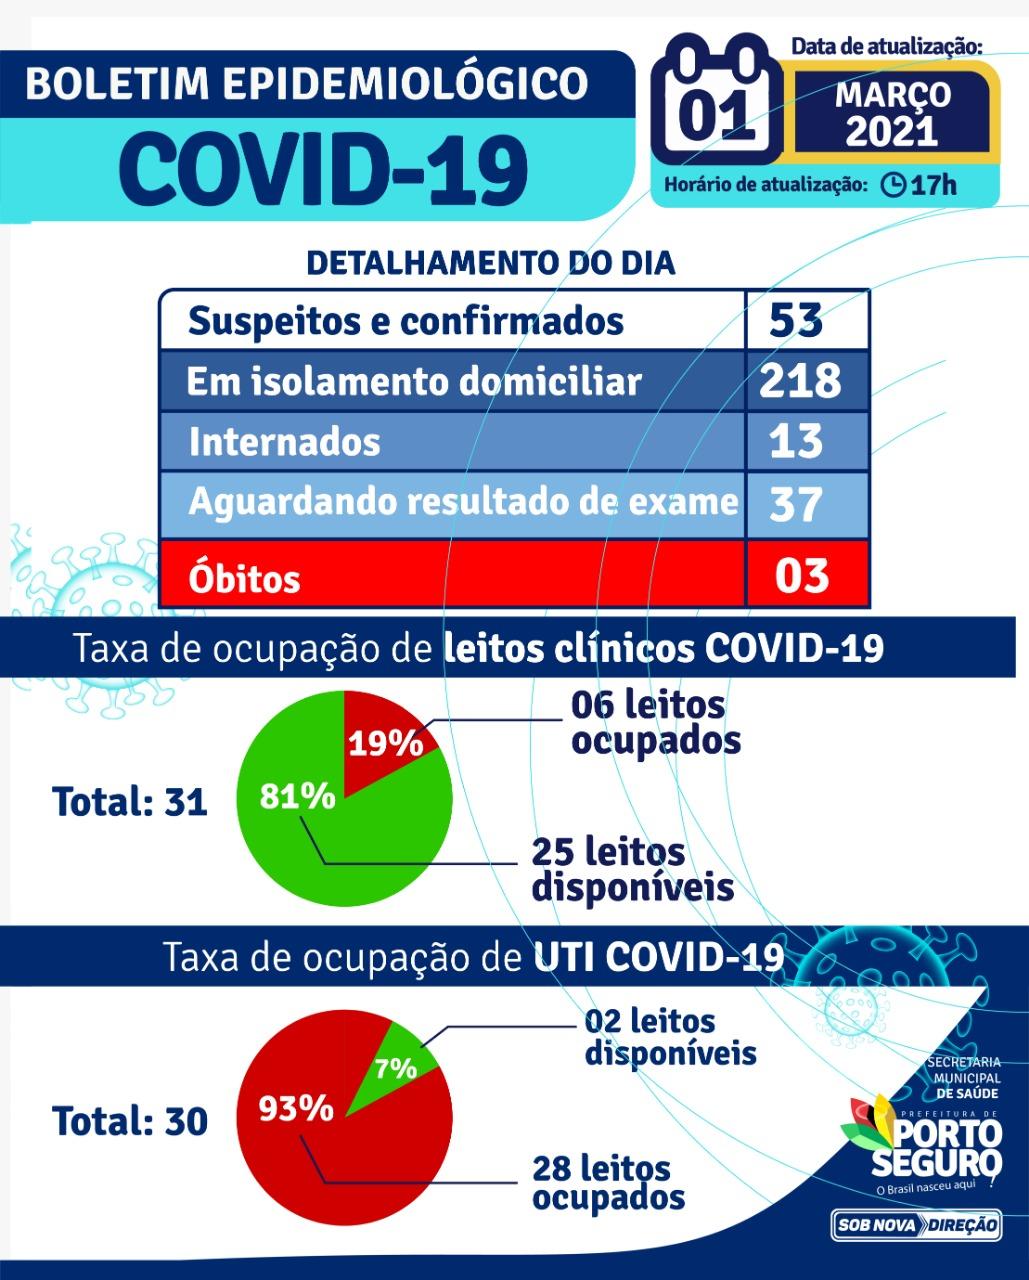 Porto Seguro: Boletim Epidemiológico COVID-19, 01-03-2021 18